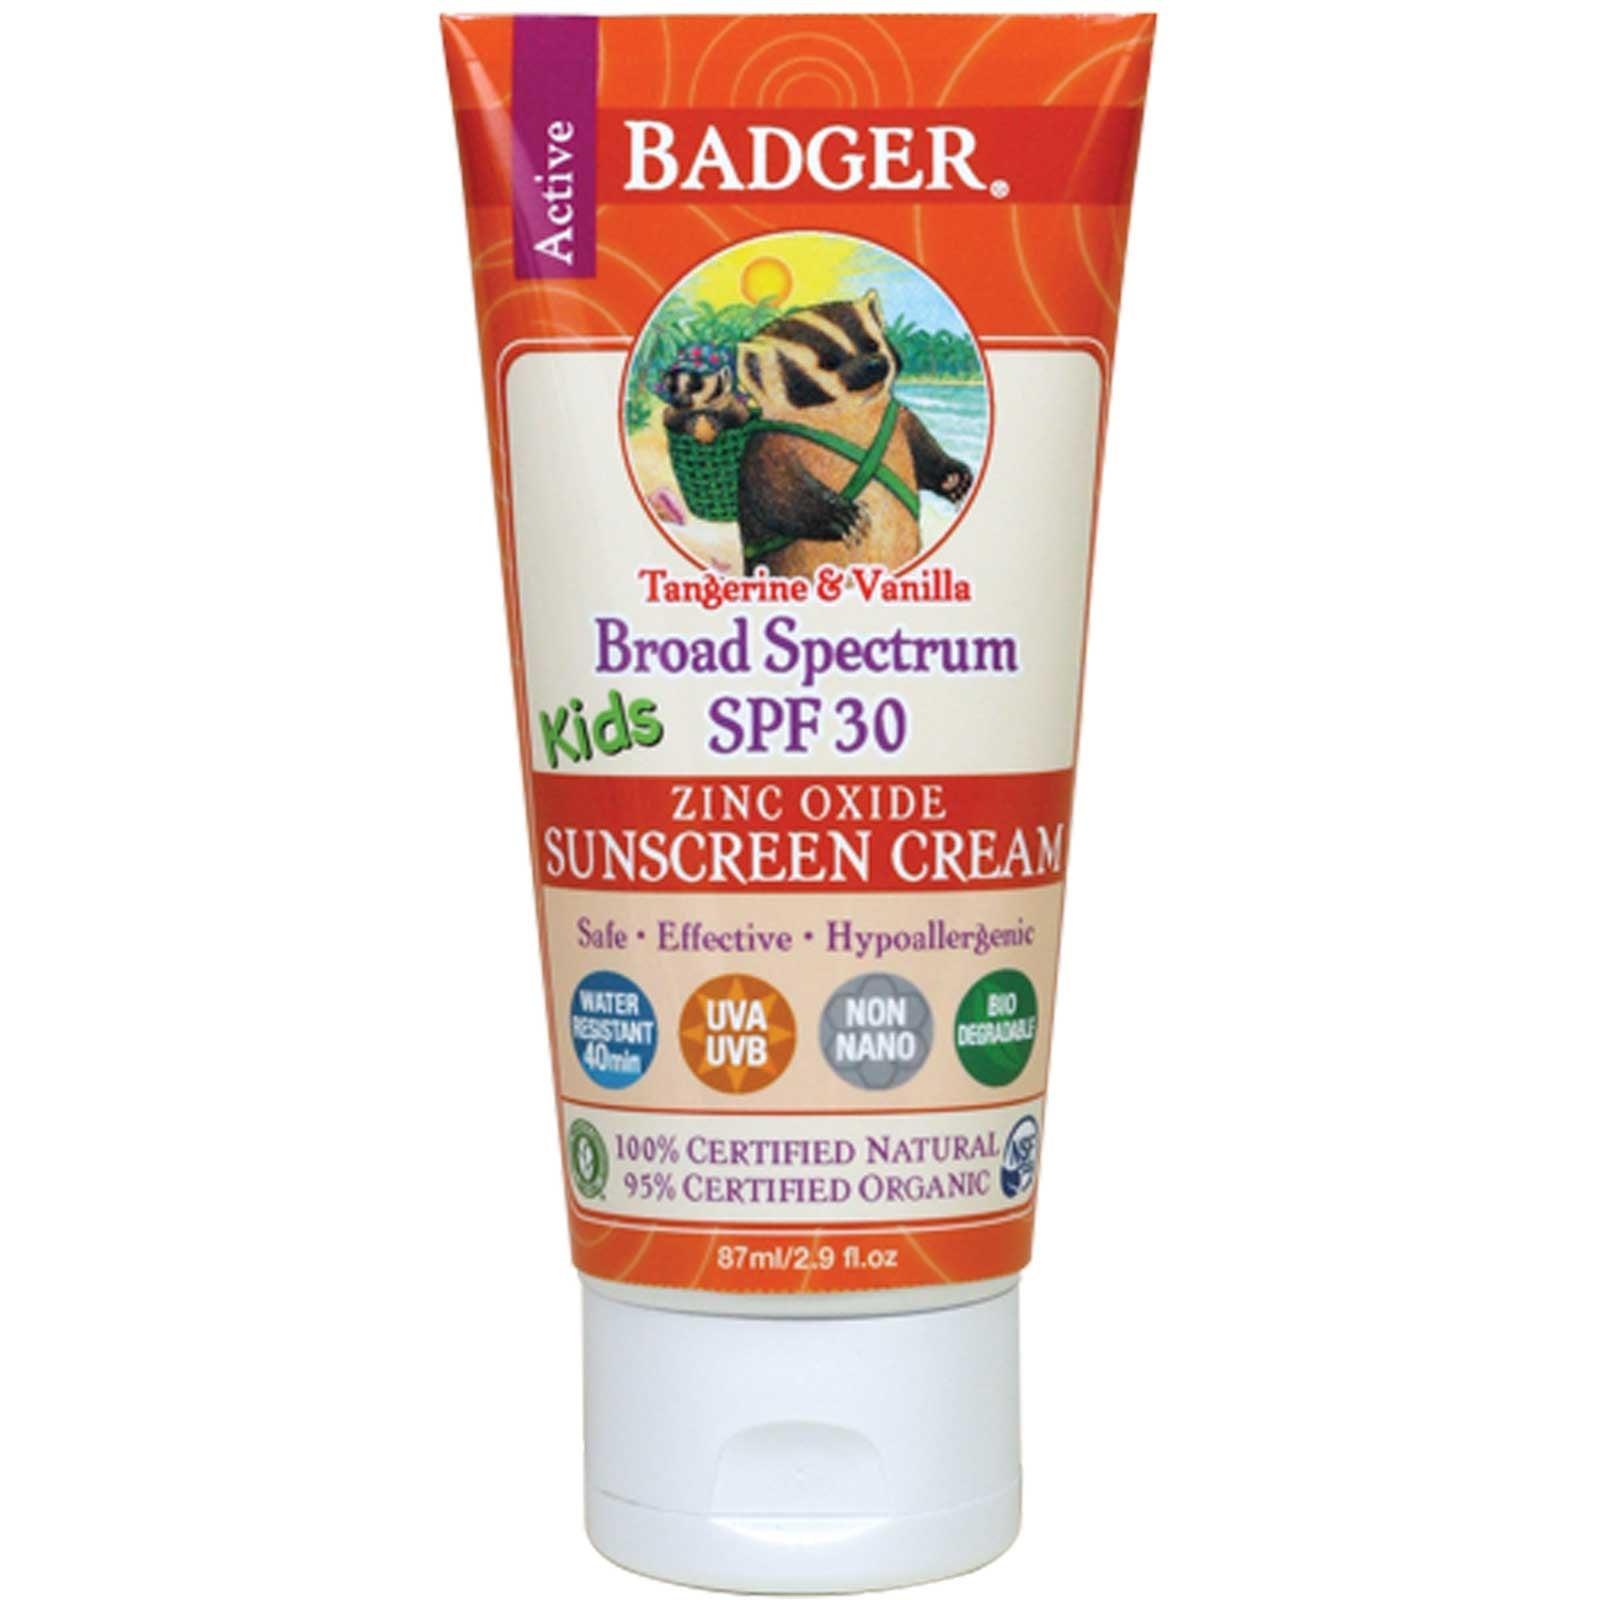 Health Food Store Find: Badger Kids Sunscreen Cream, SPF 30